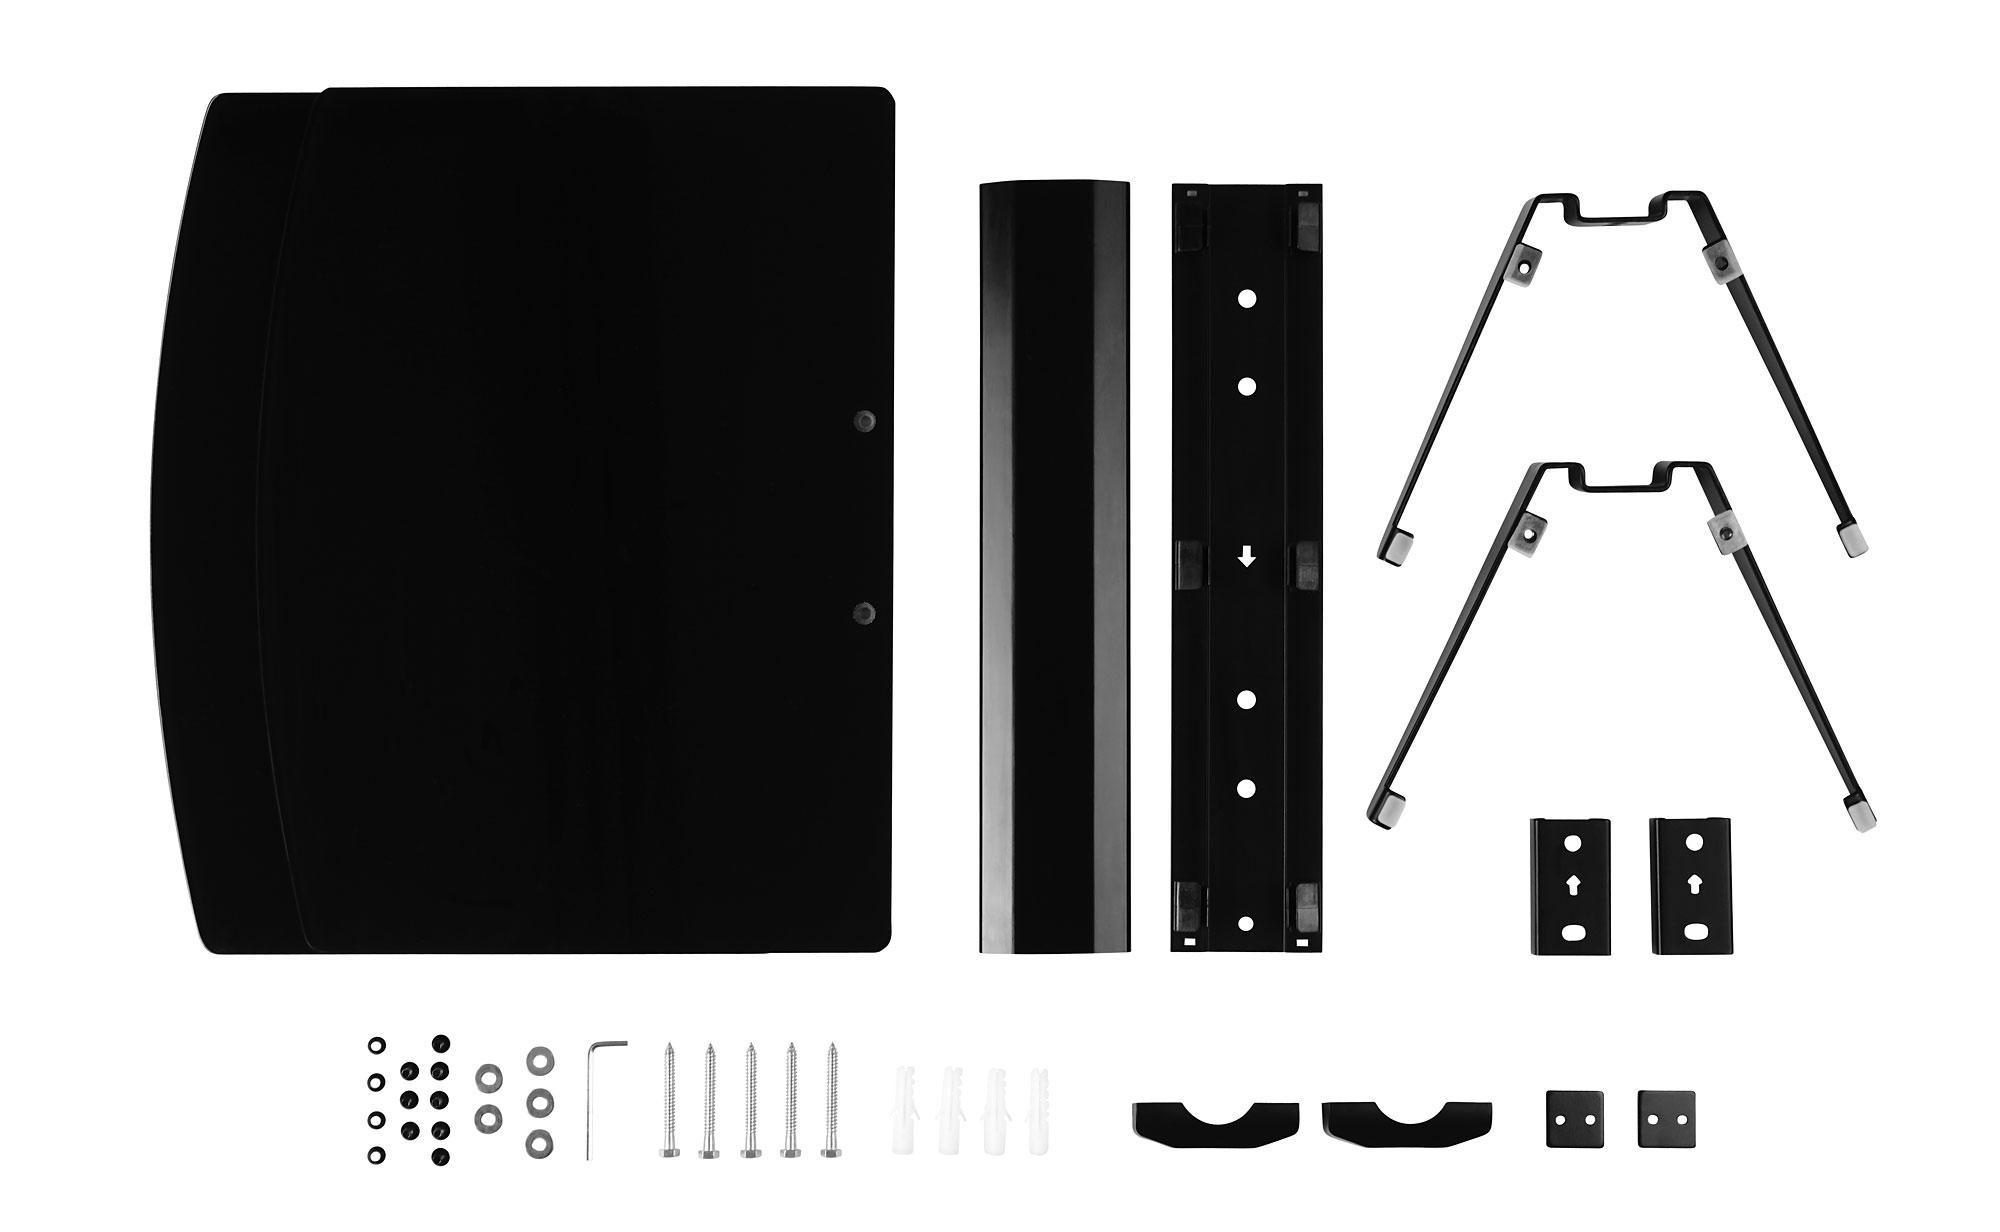 Pronomic DVD-450B DVD Hifi Multimedia Glas Wandregal, schwarz